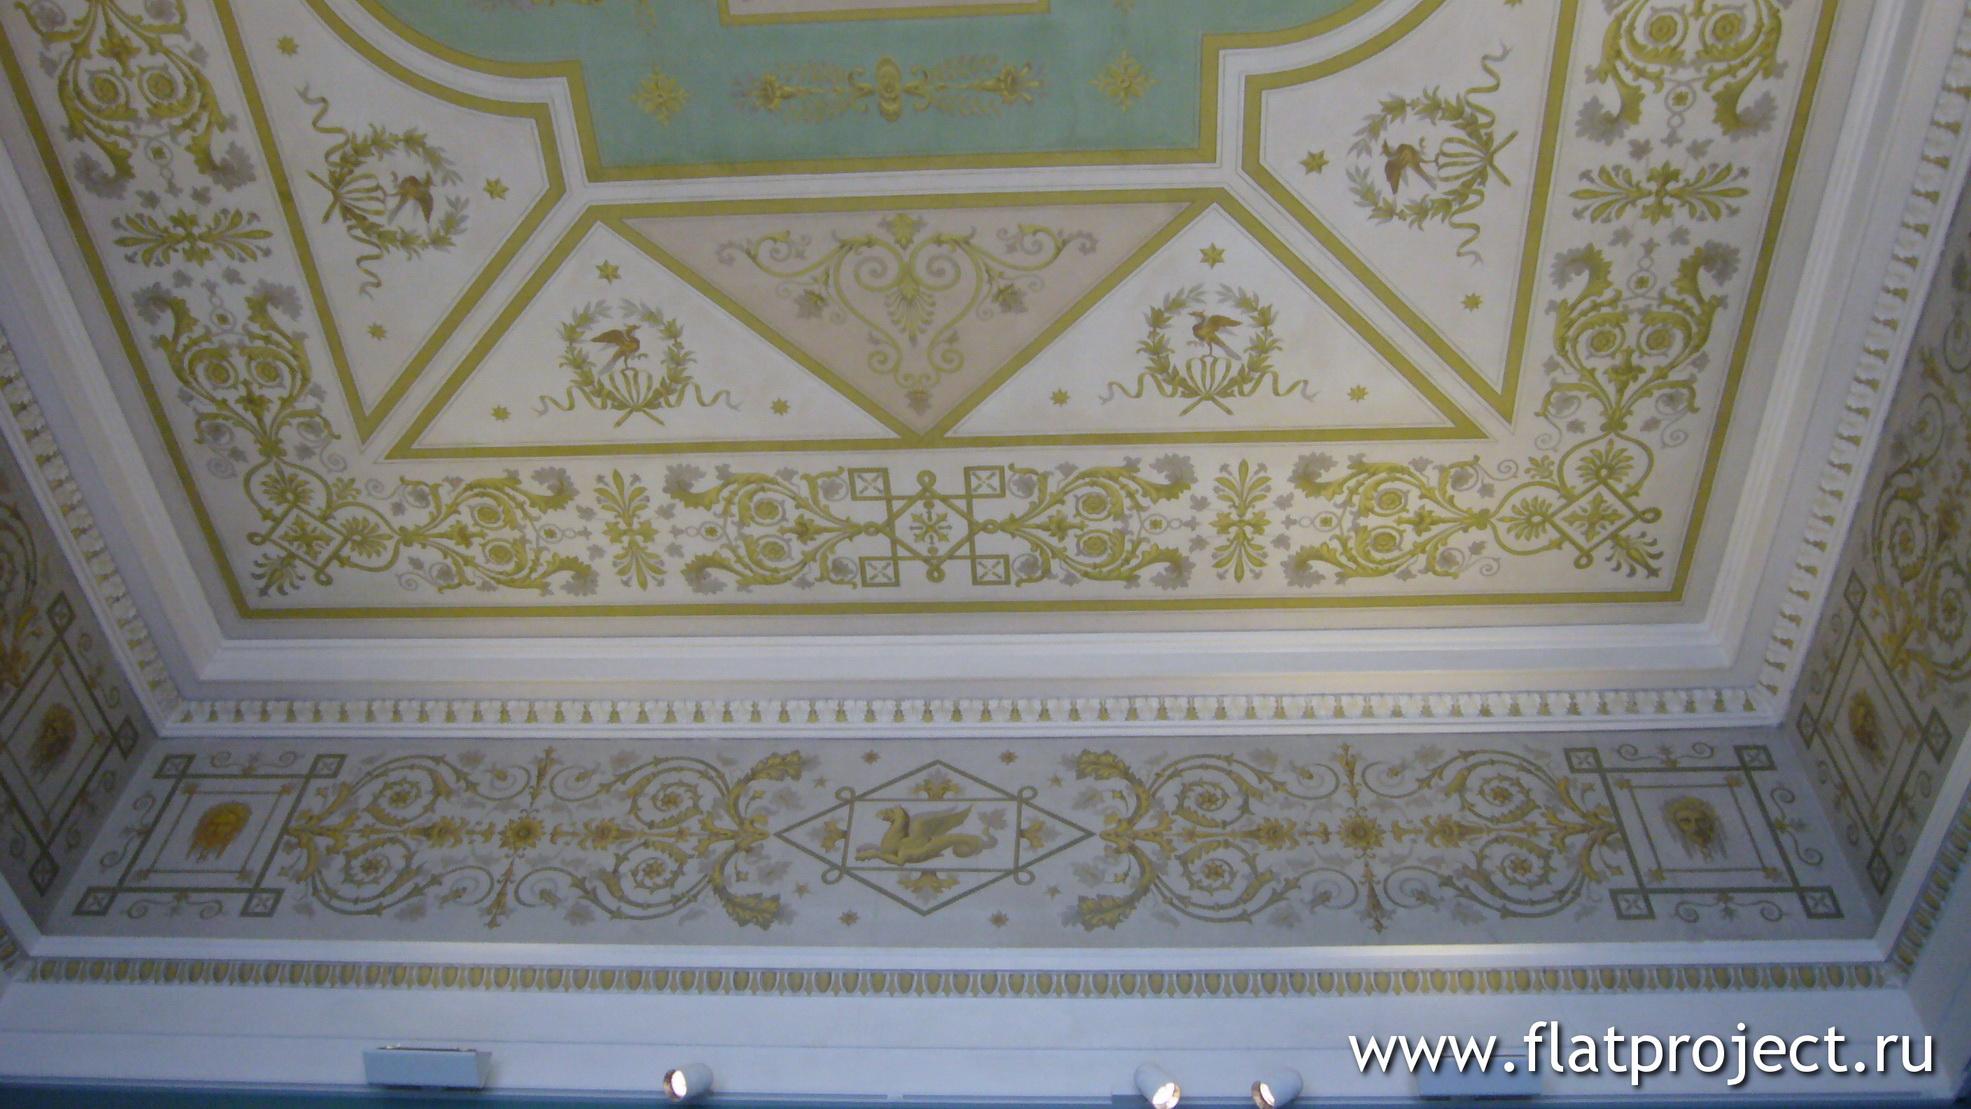 The State Hermitage museum interiors – photo 215